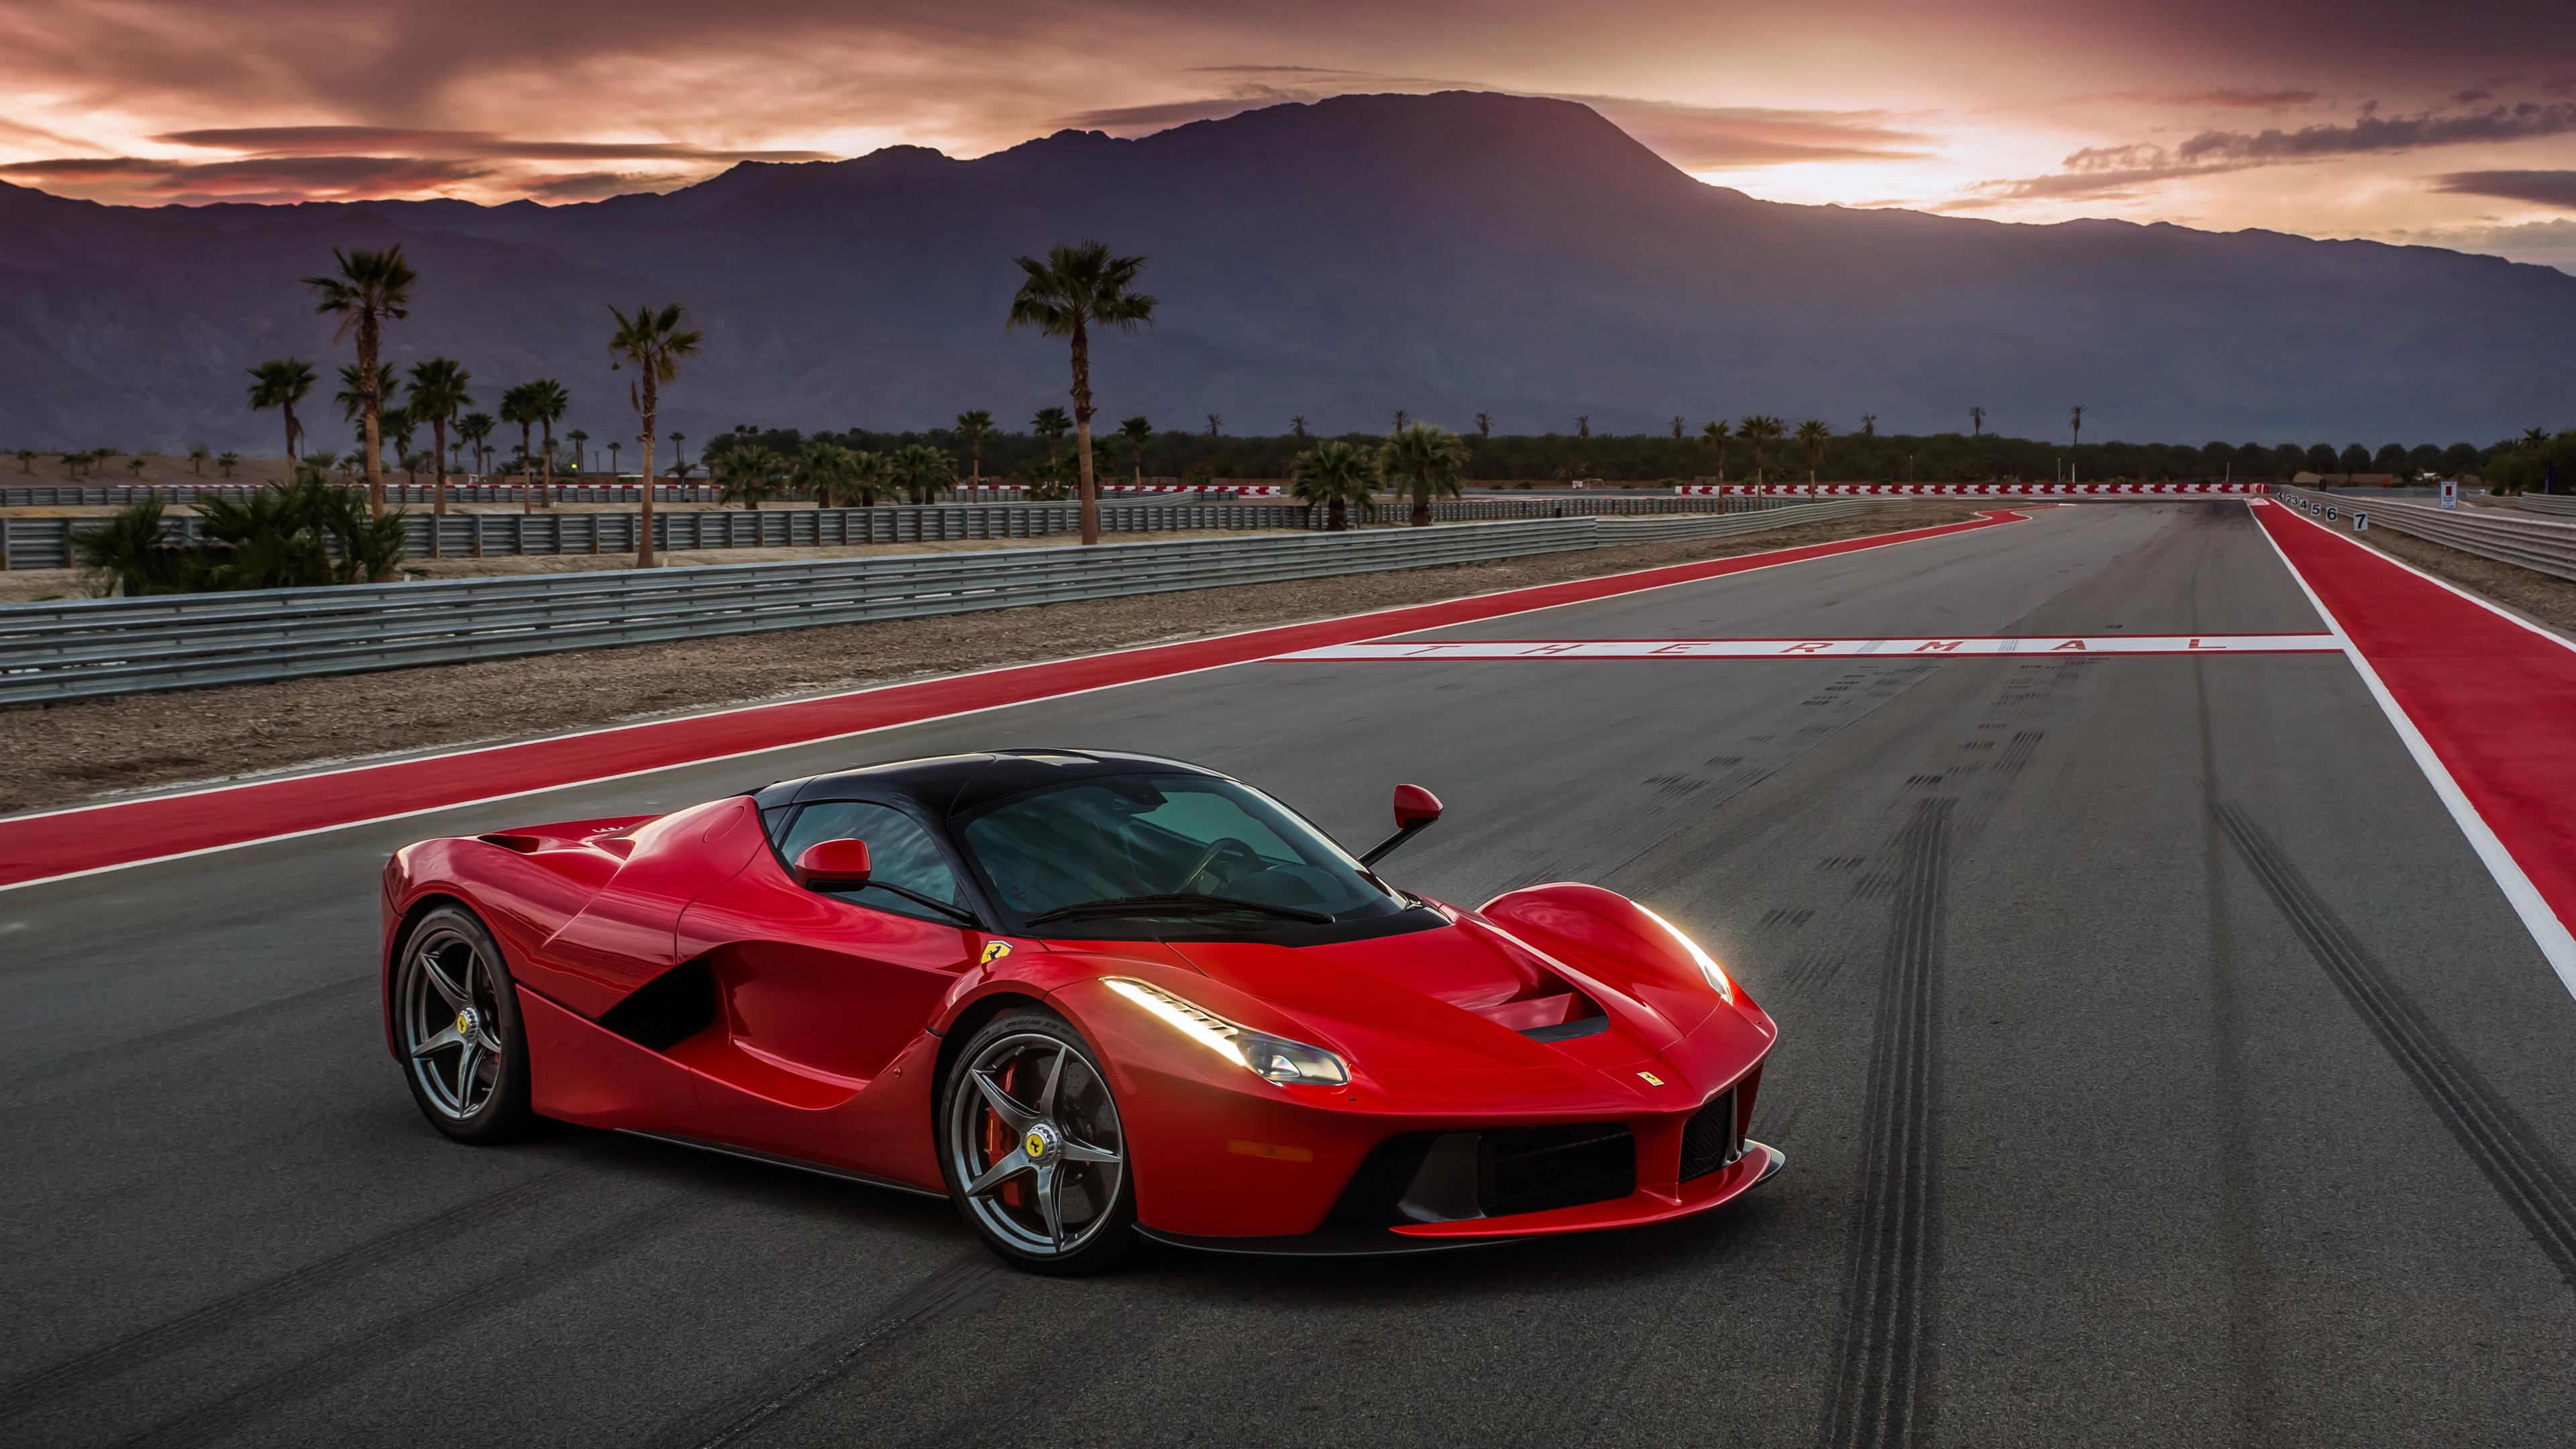 Iphone 4 Car Wallpapers Ferrari Laferrari 4k Wallpaper Hd Car Wallpapers Id 6928